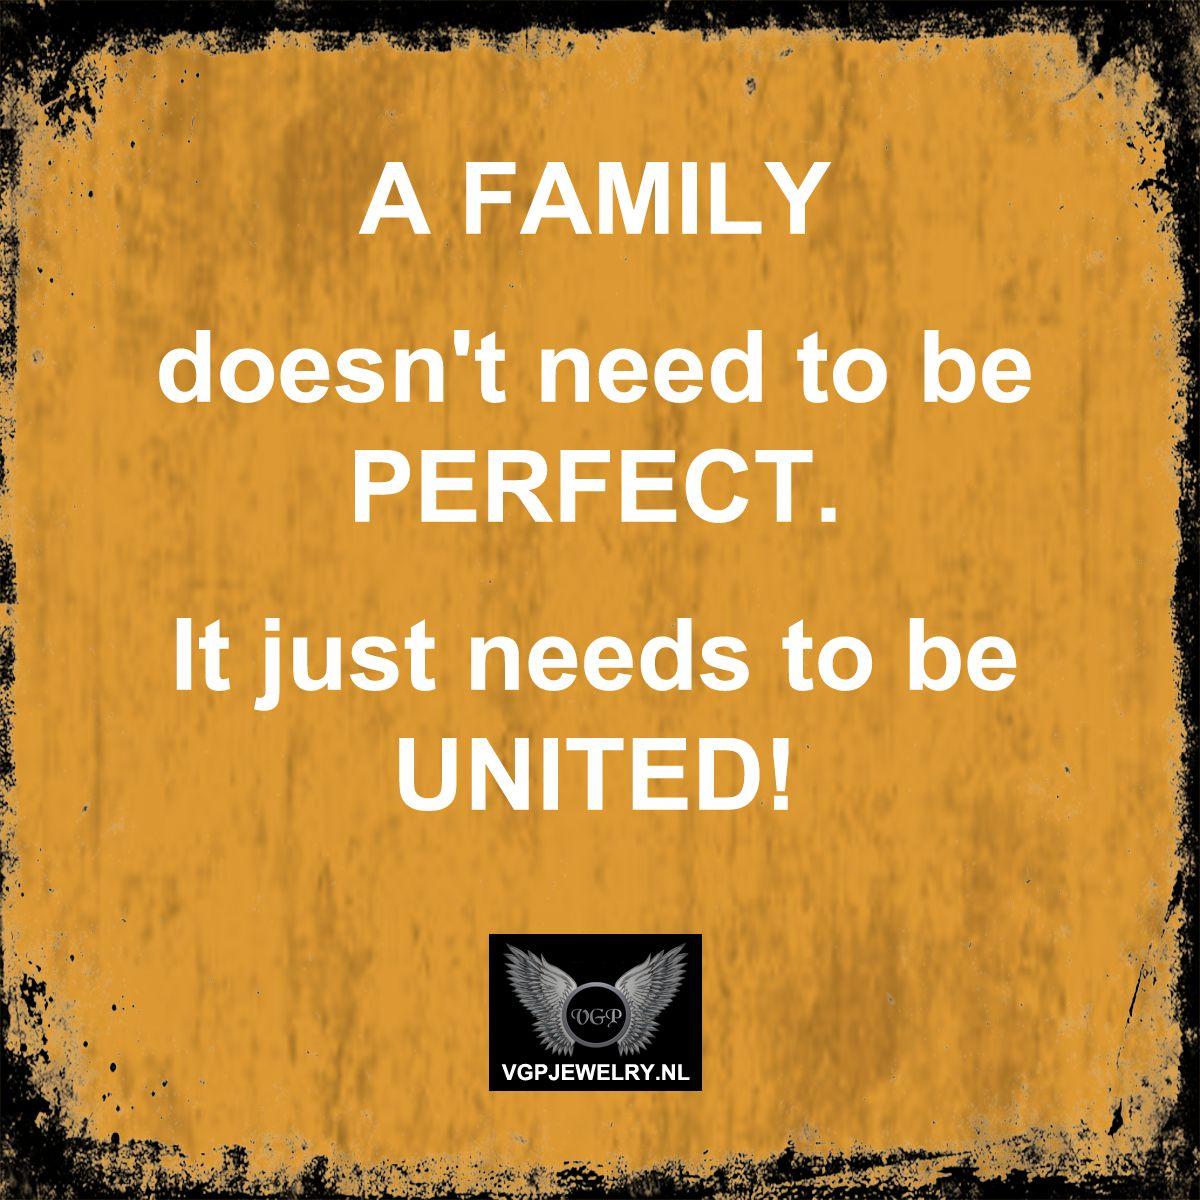 3 Love To Quote 3 Family Bonding Quotes Bond Quotes Best Quotes